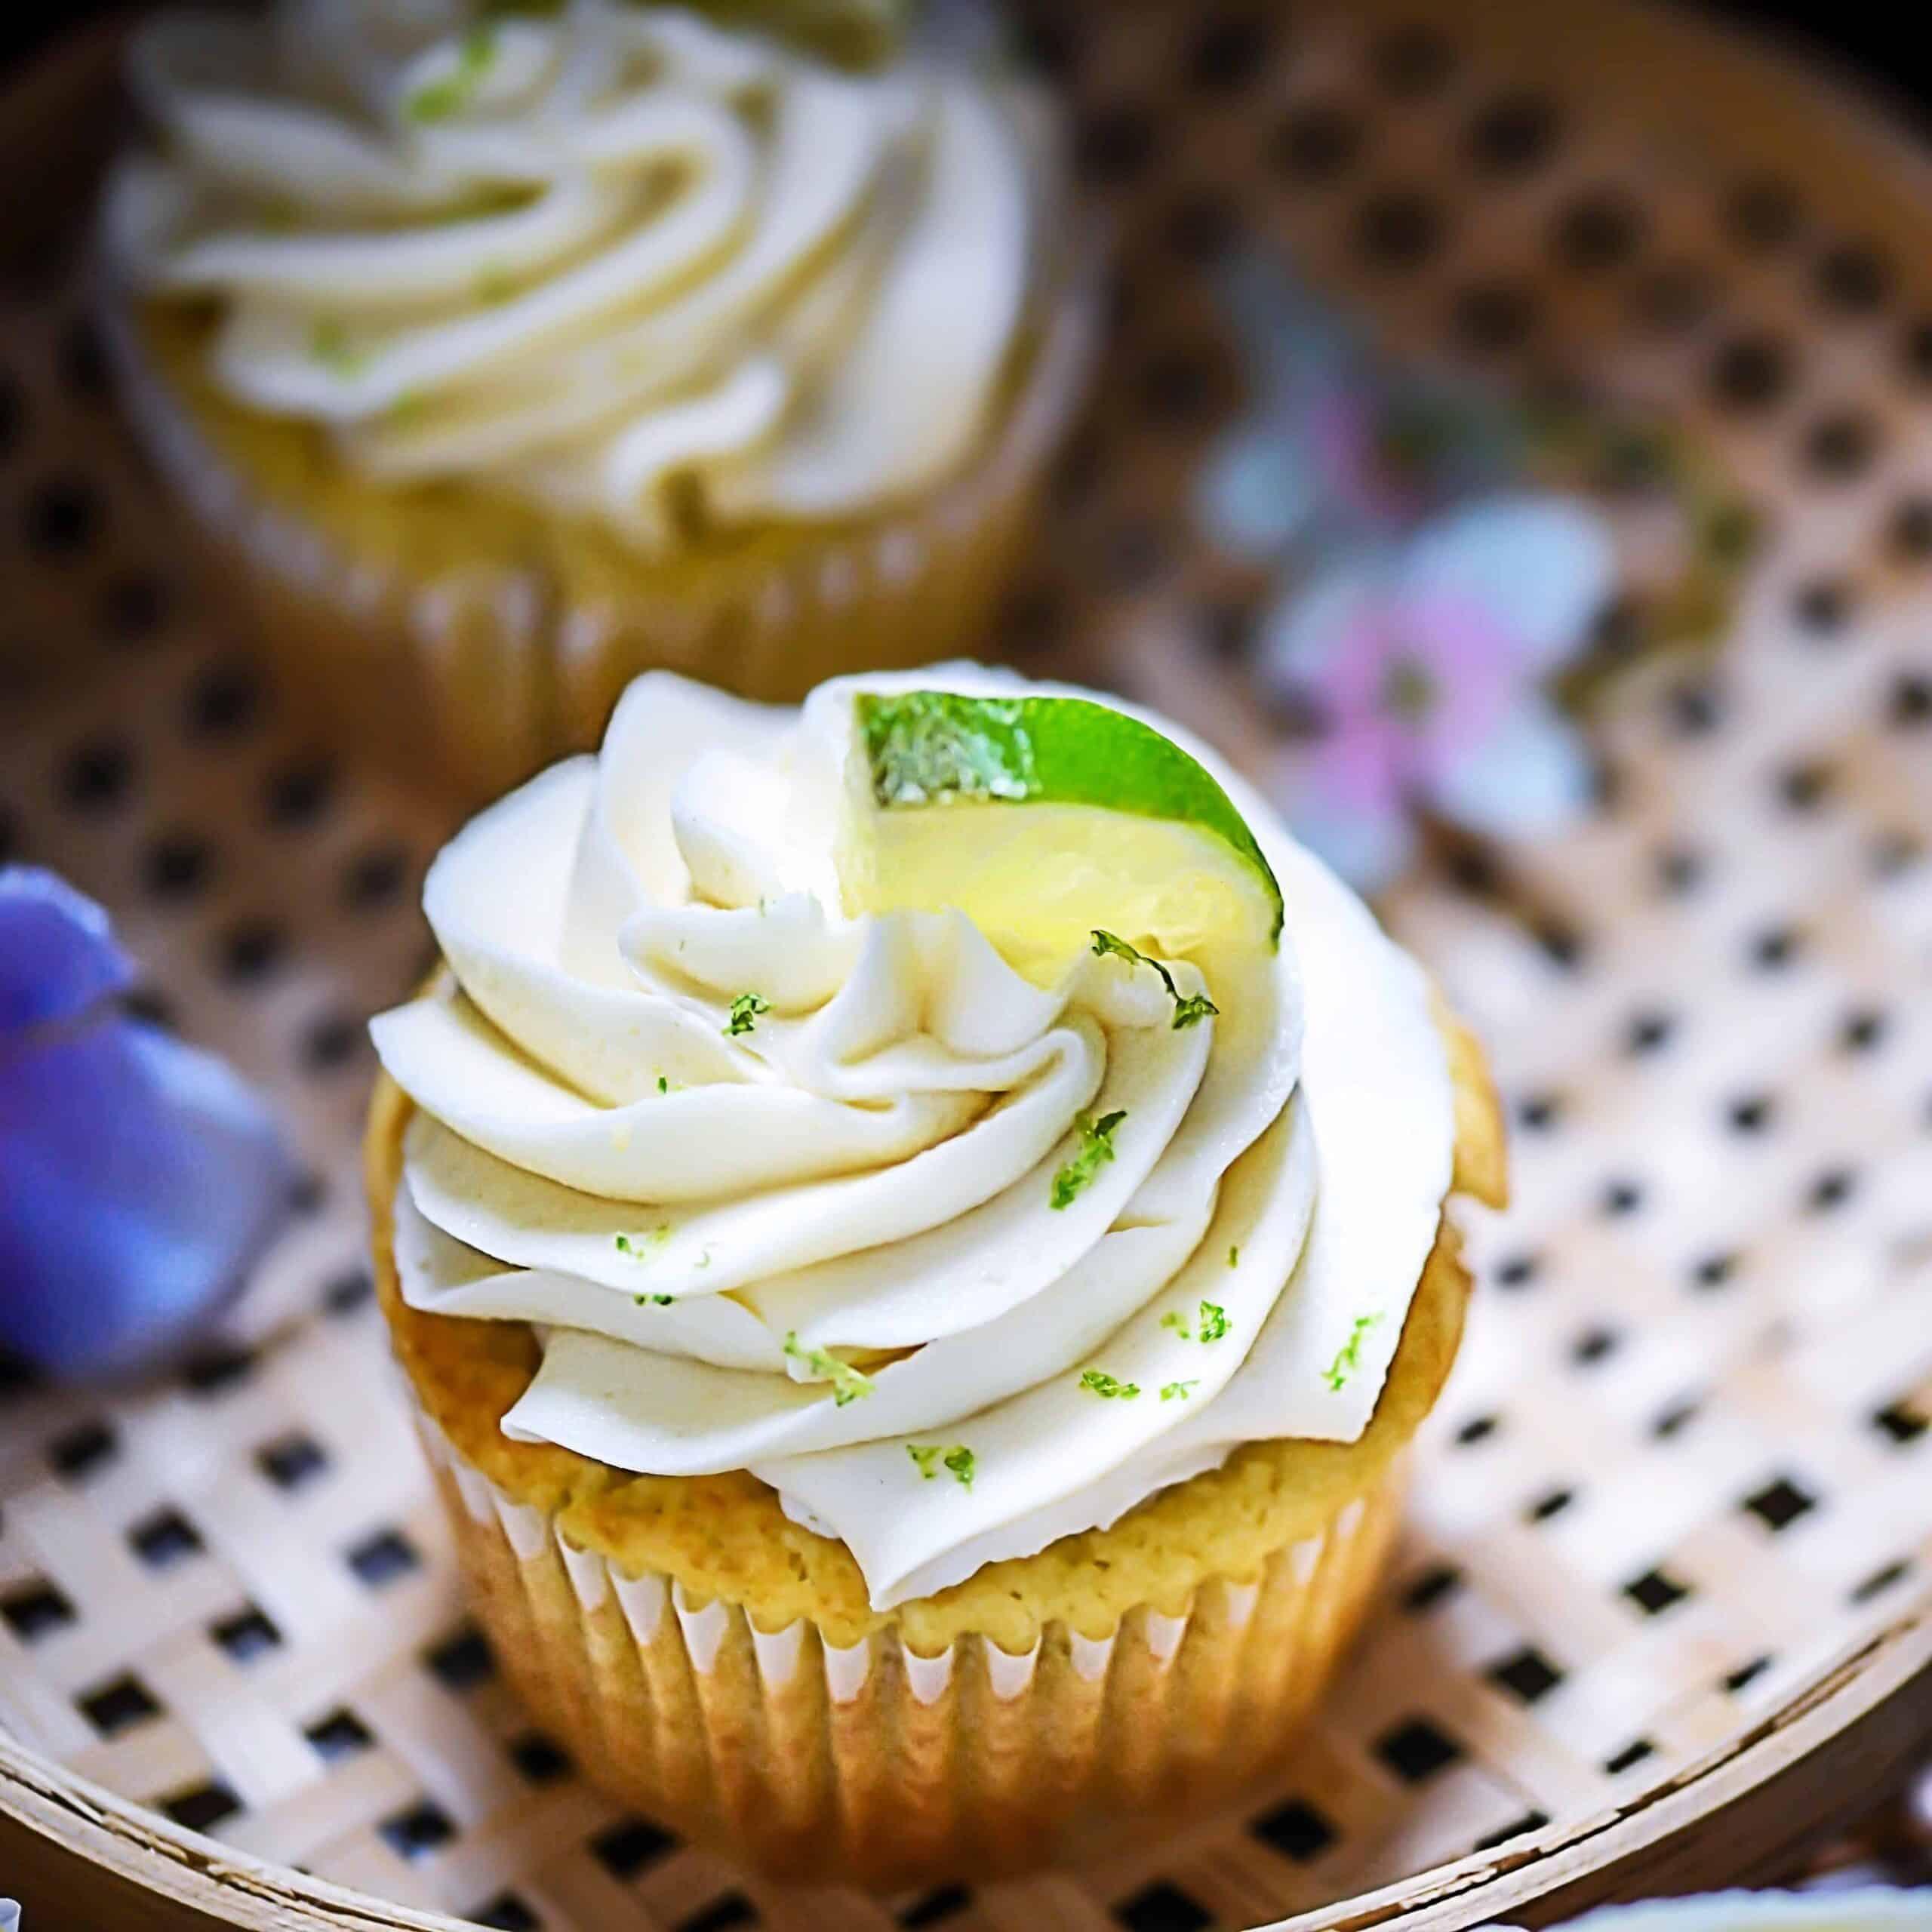 Grain-Free Cupcakes in basket